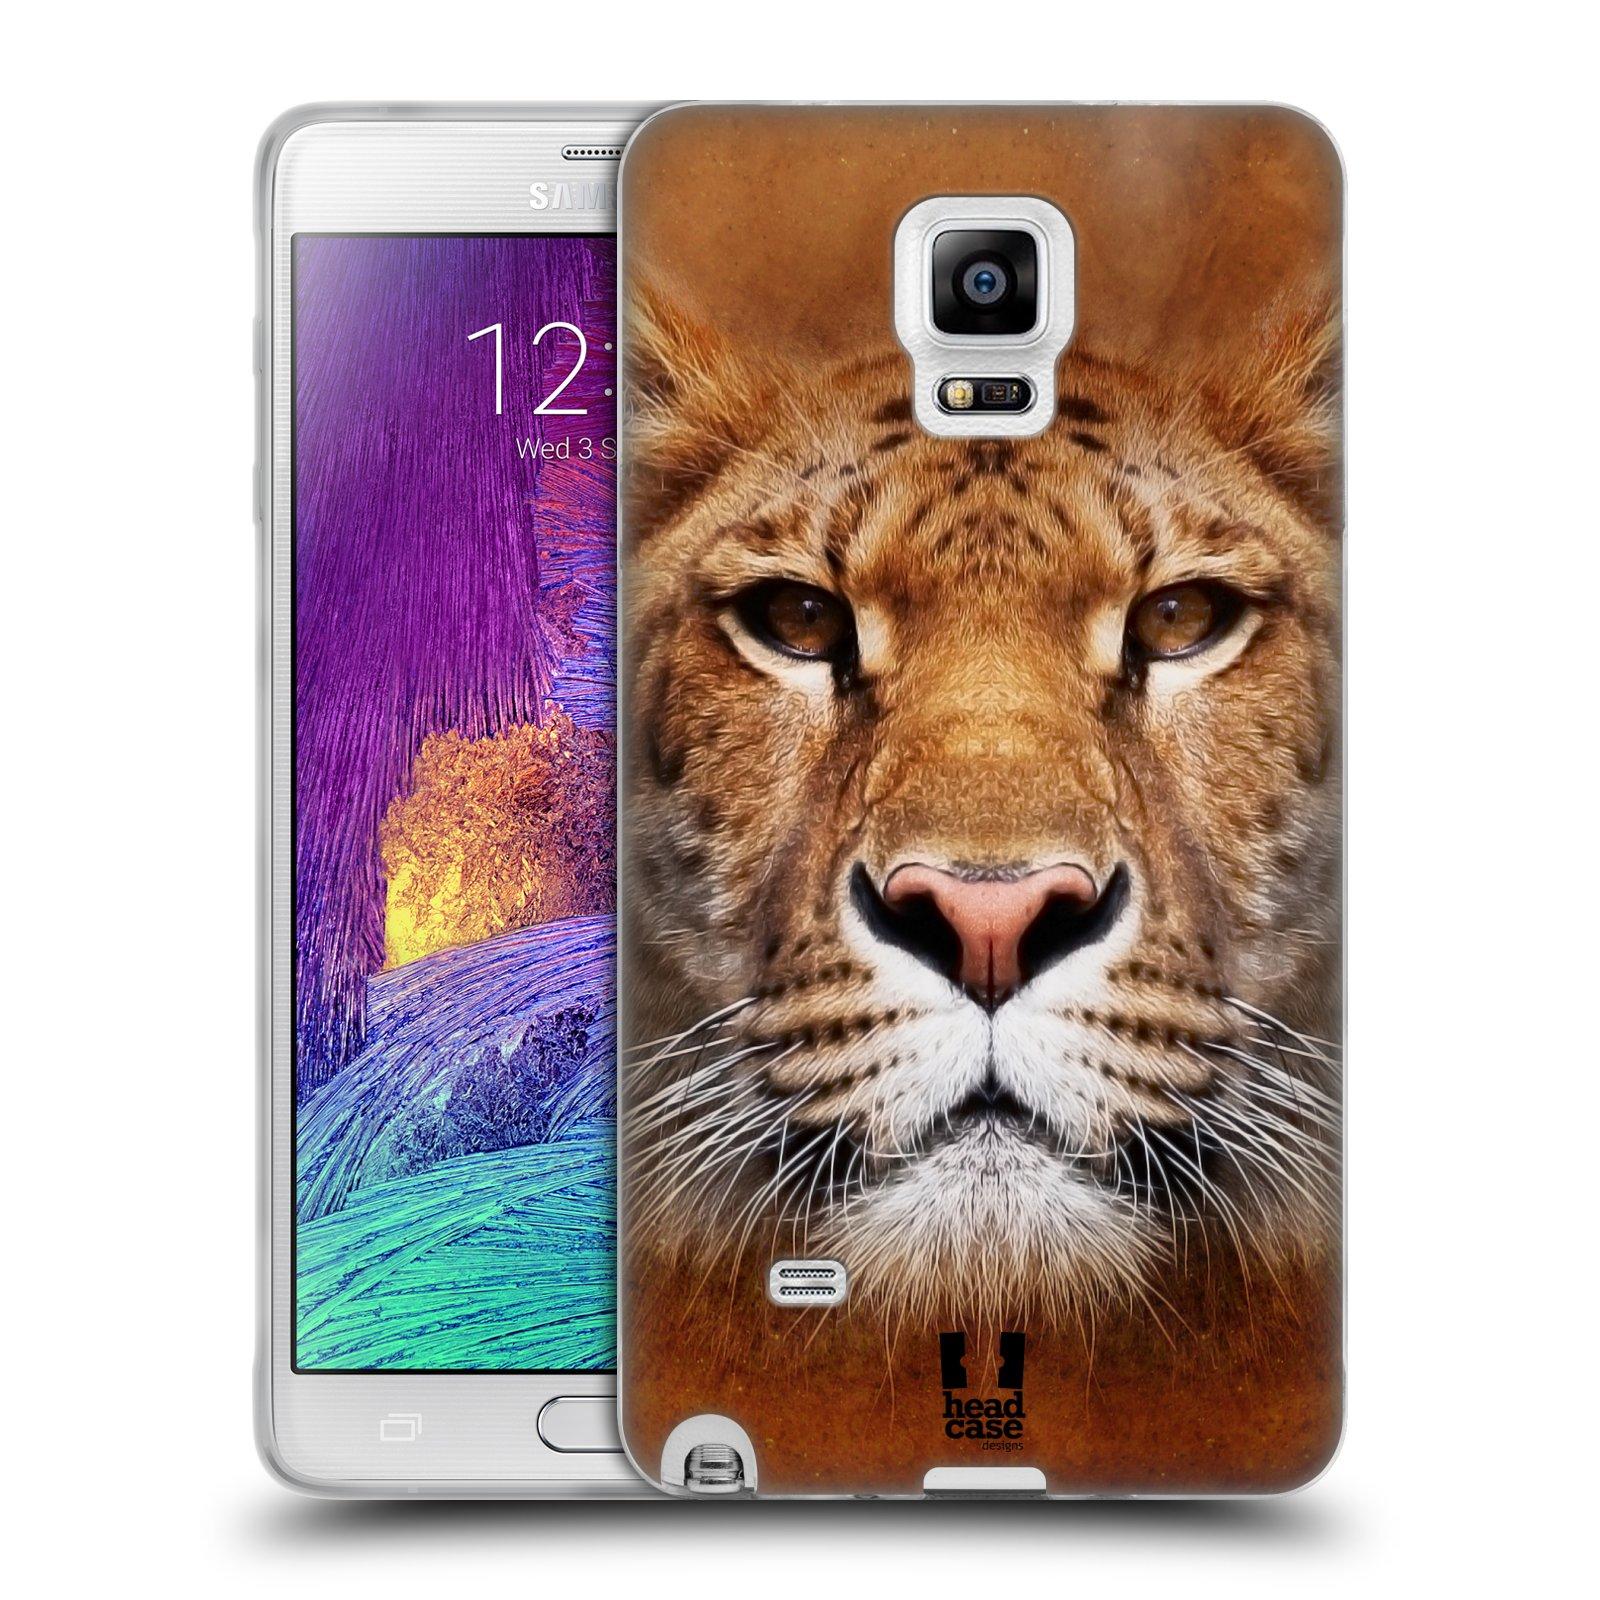 HEAD CASE silikonový obal na mobil Samsung Galaxy Note 4 (N910) vzor Zvířecí tváře Sibiřský tygr